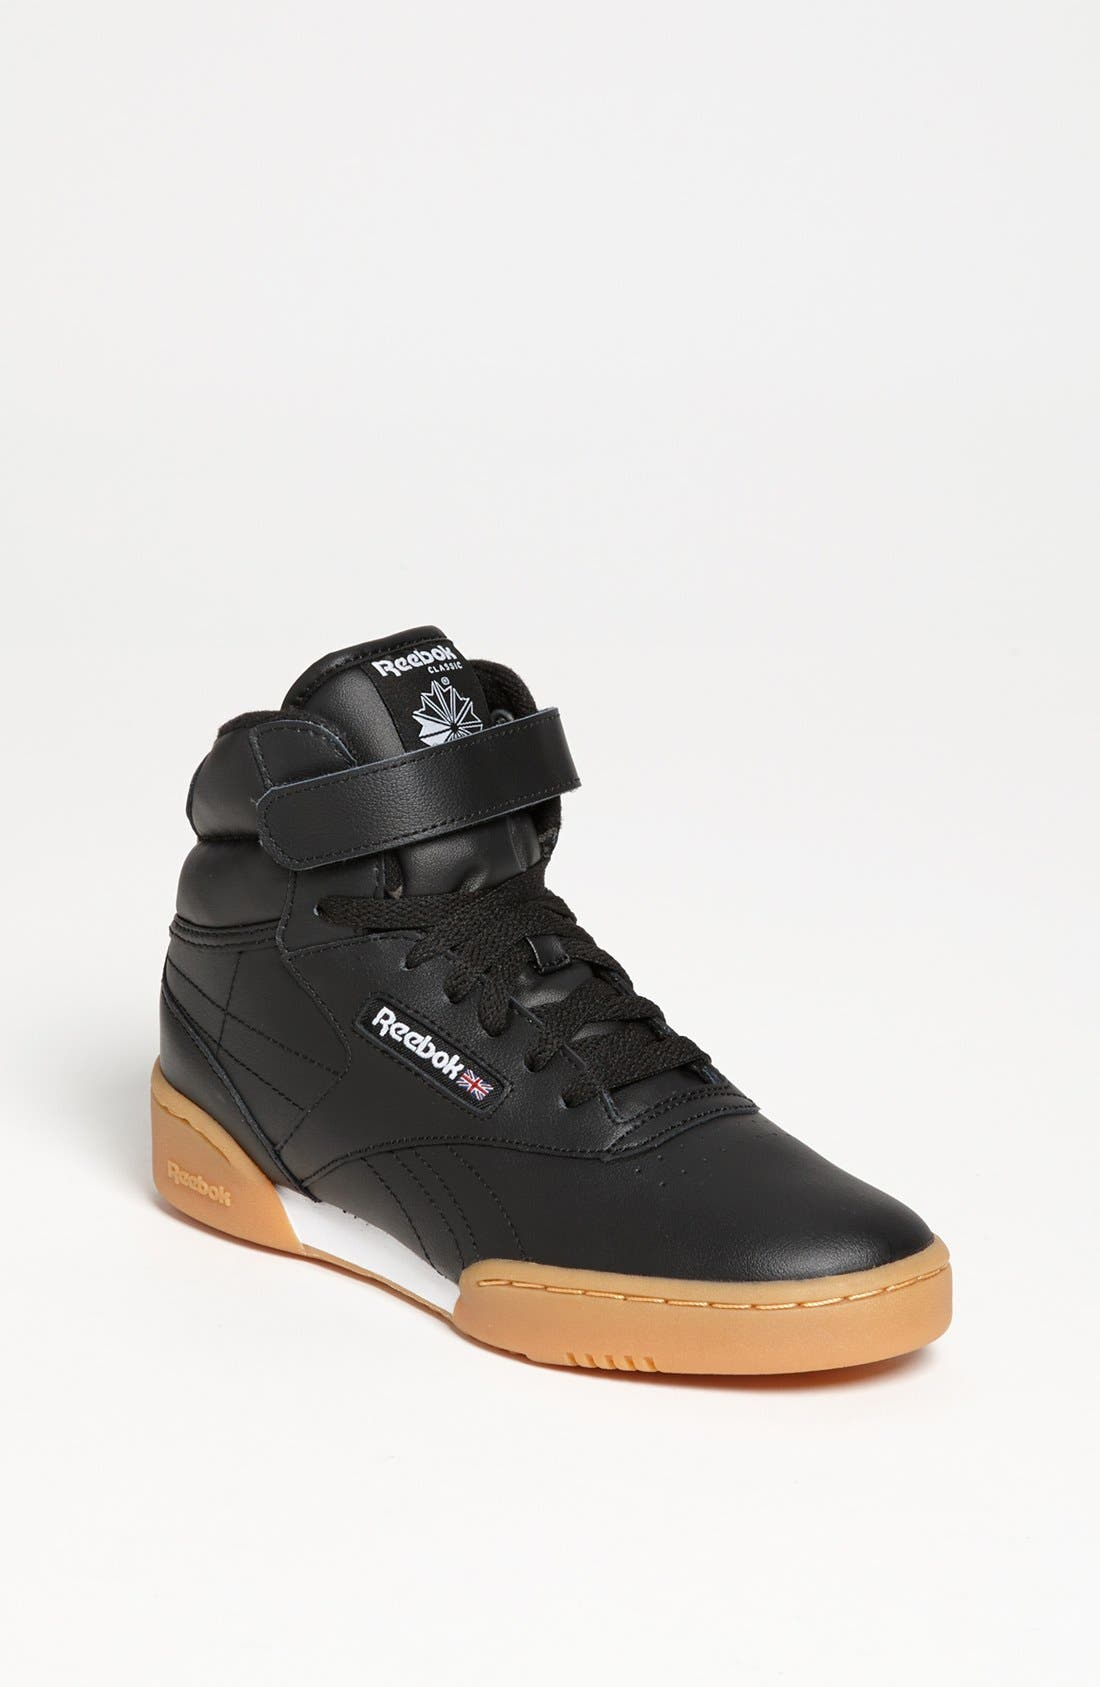 Alternate Image 1 Selected - Reebok 'Ex-O-Fit Hi' Sneaker (Big Kid)